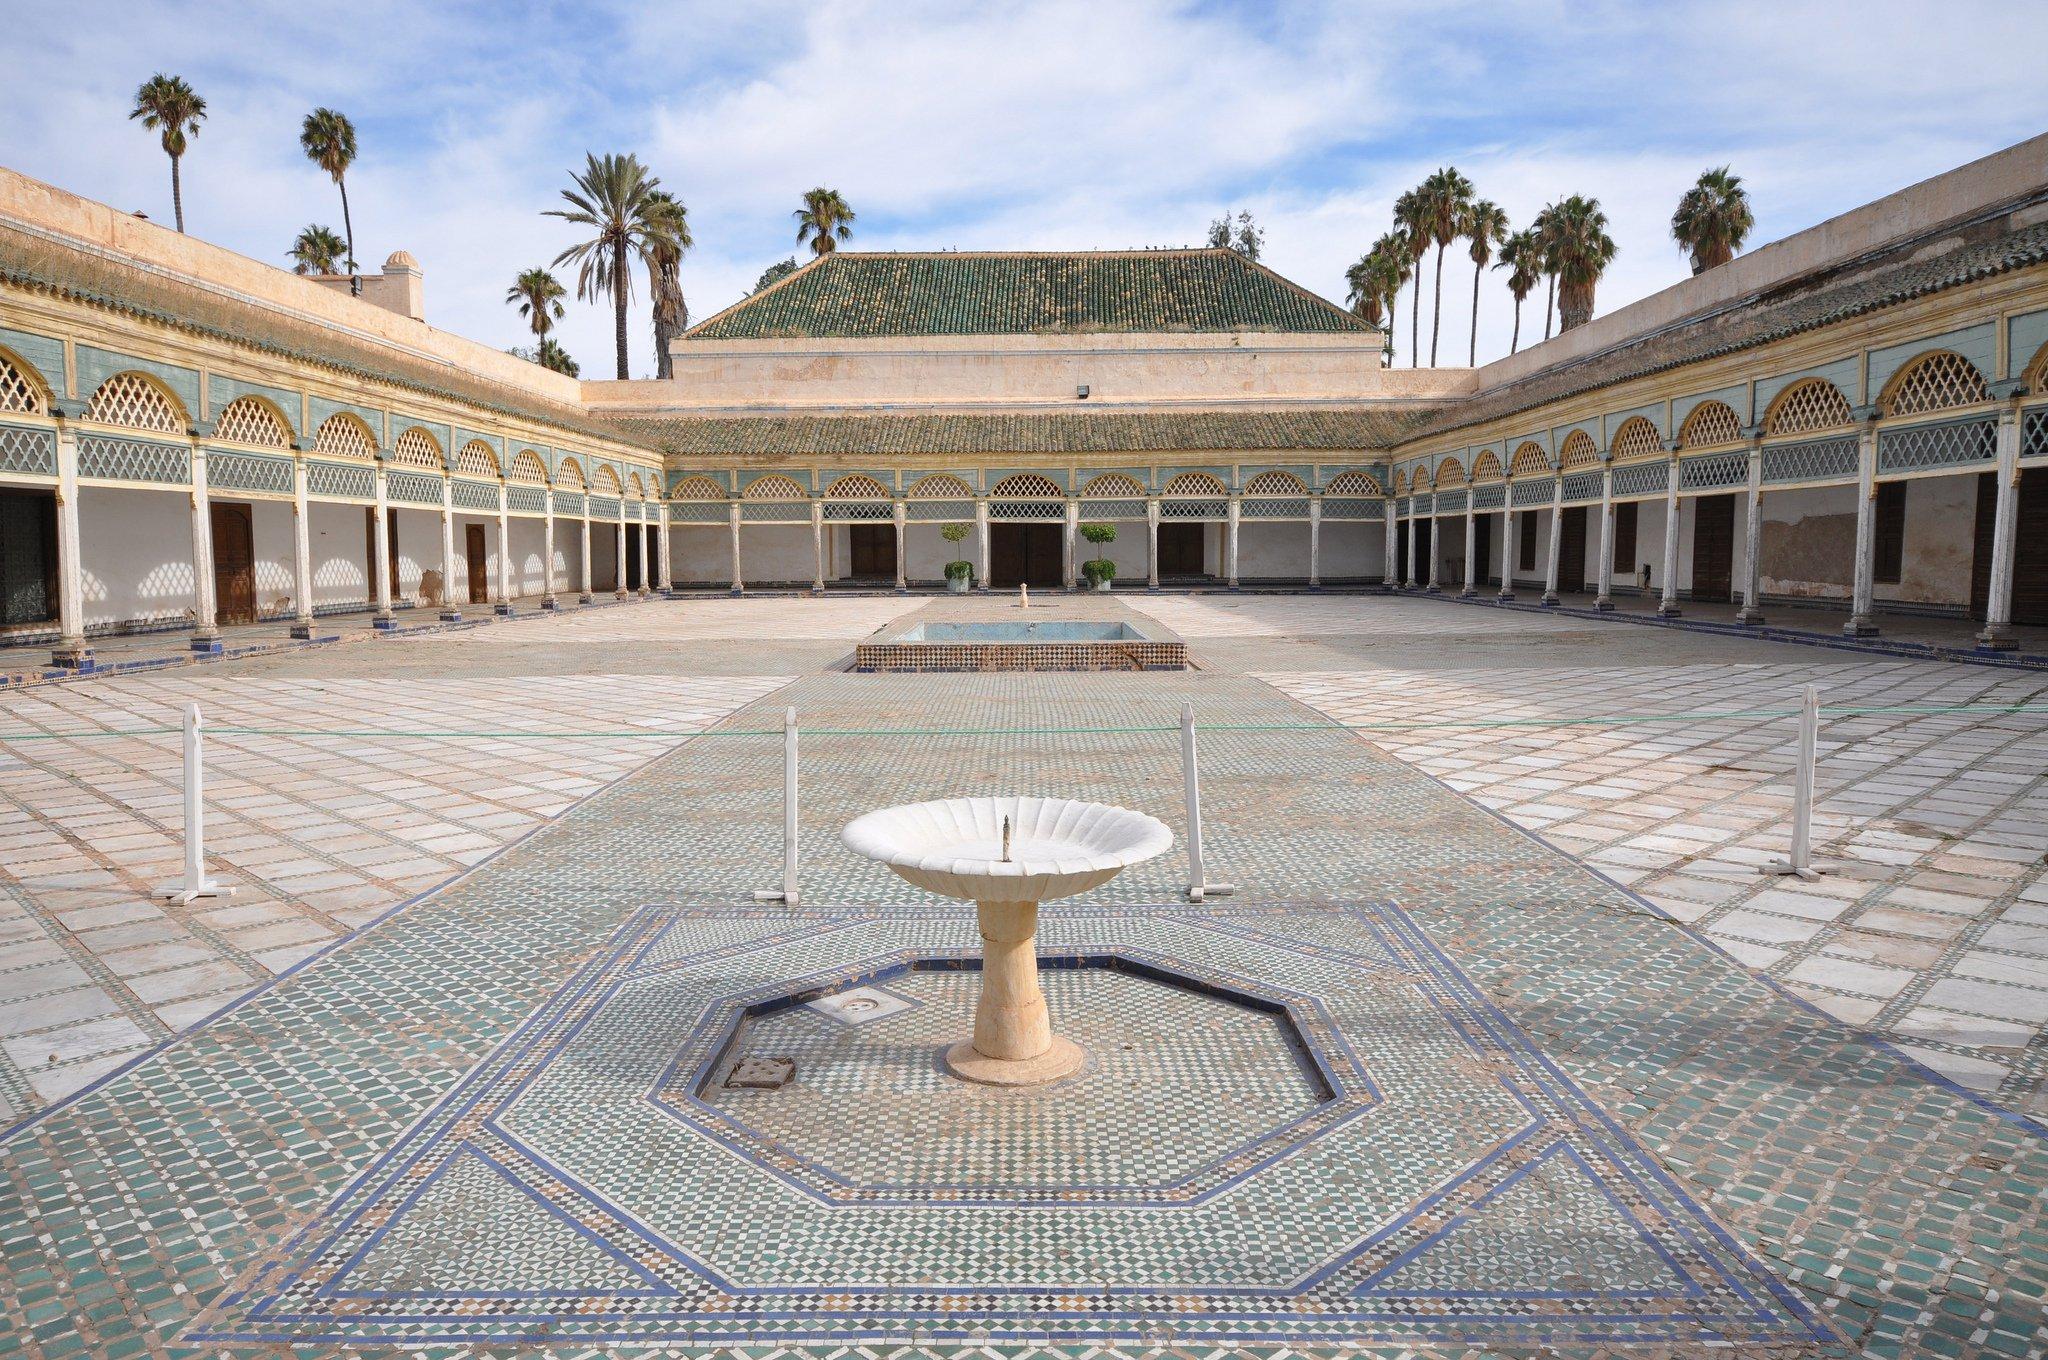 Marrakesh-24-hours-bahia-palace